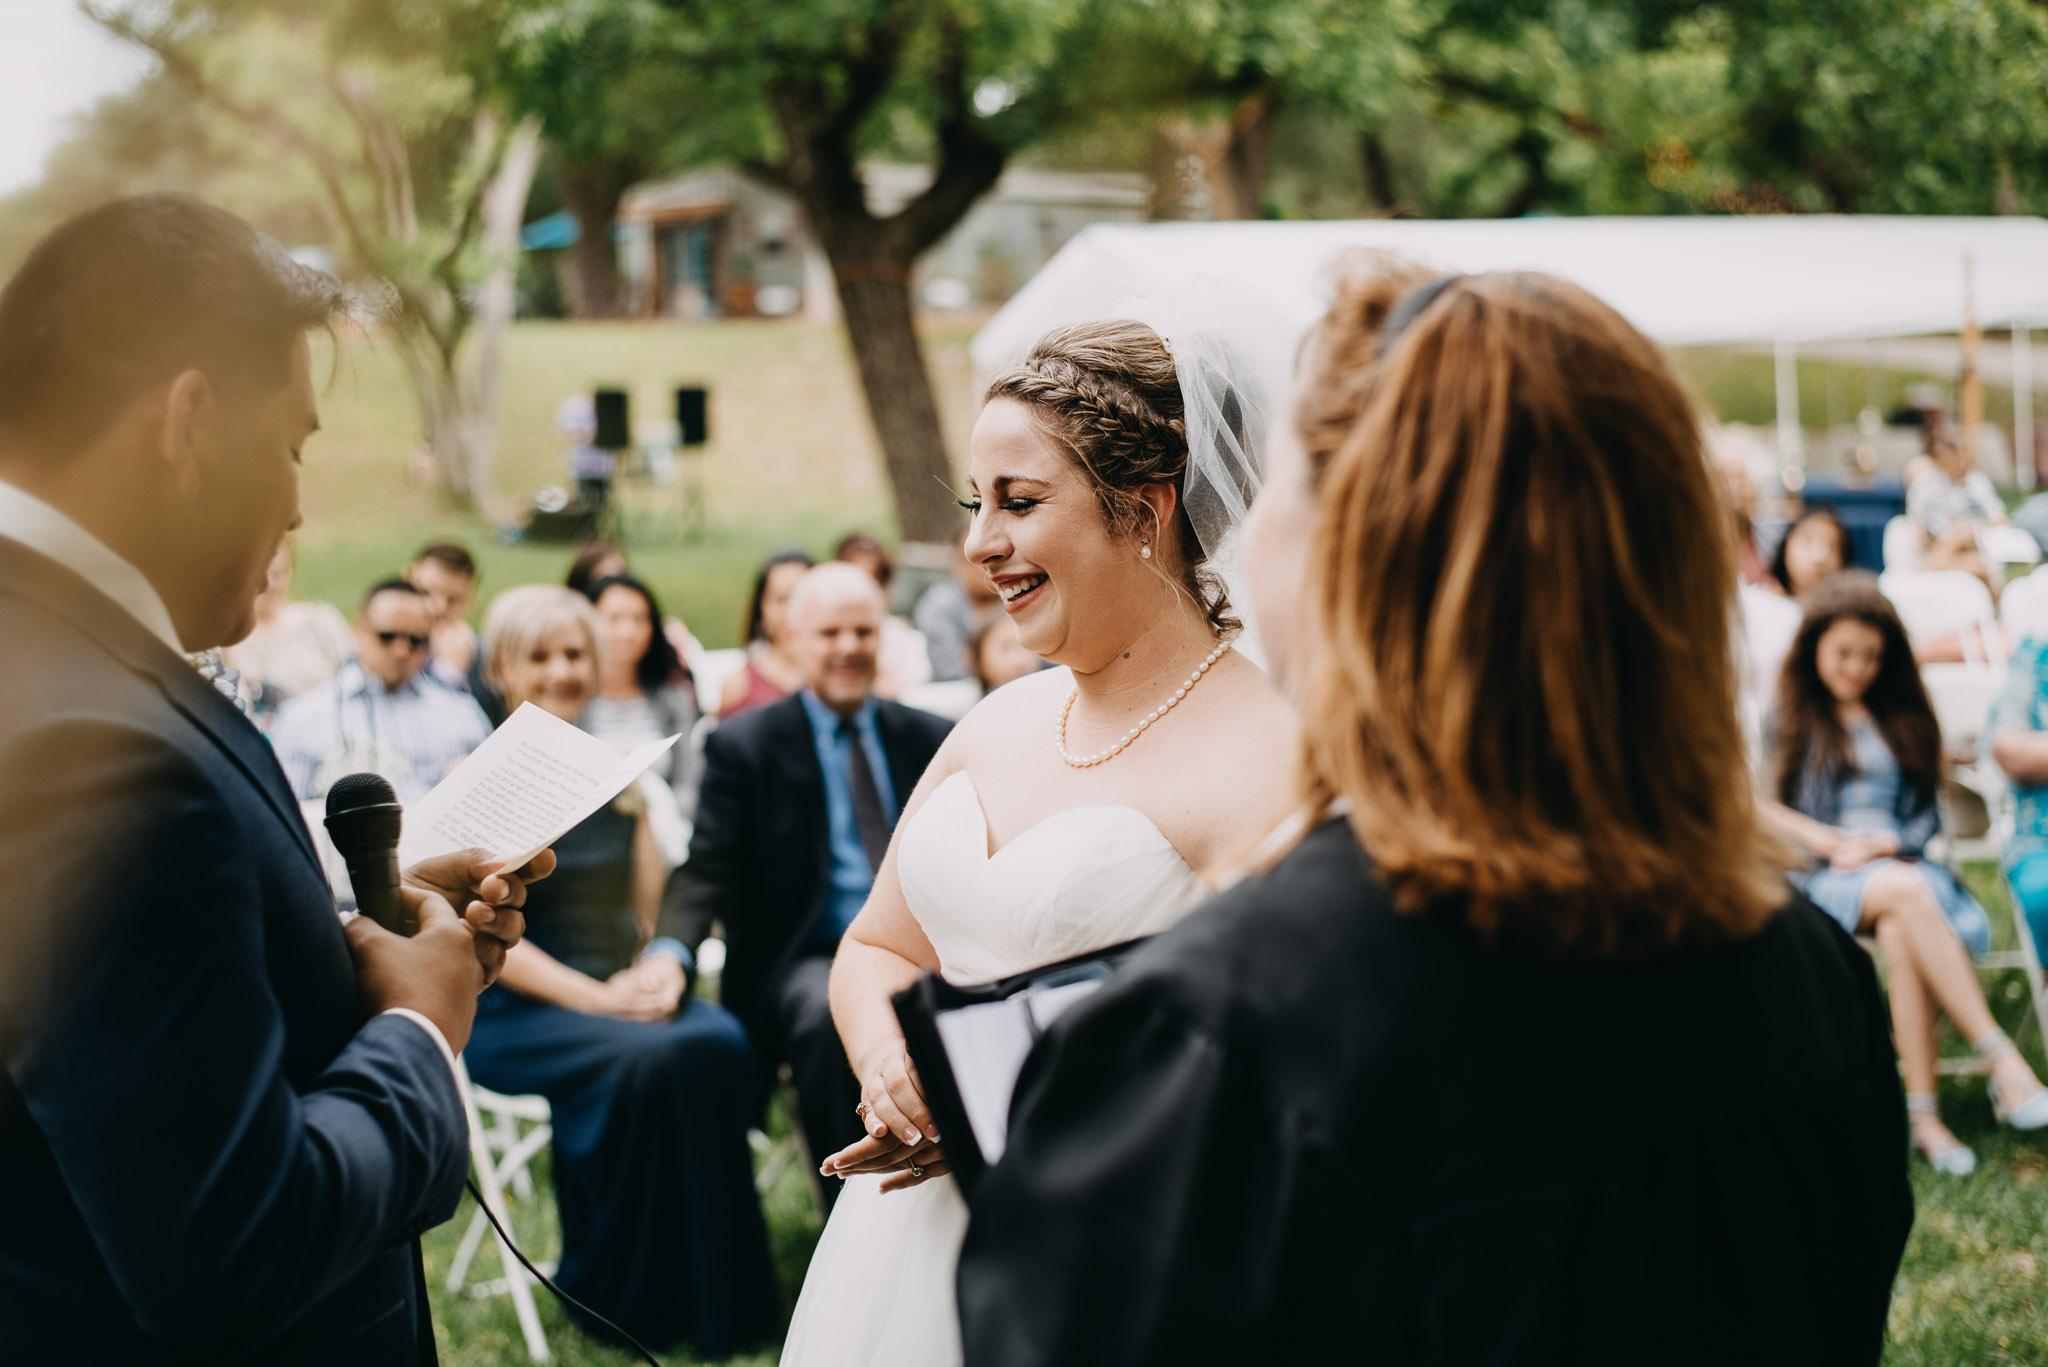 Christoval-Texas-Wedding_Photographer-Meghan&Tony-0014.jpg